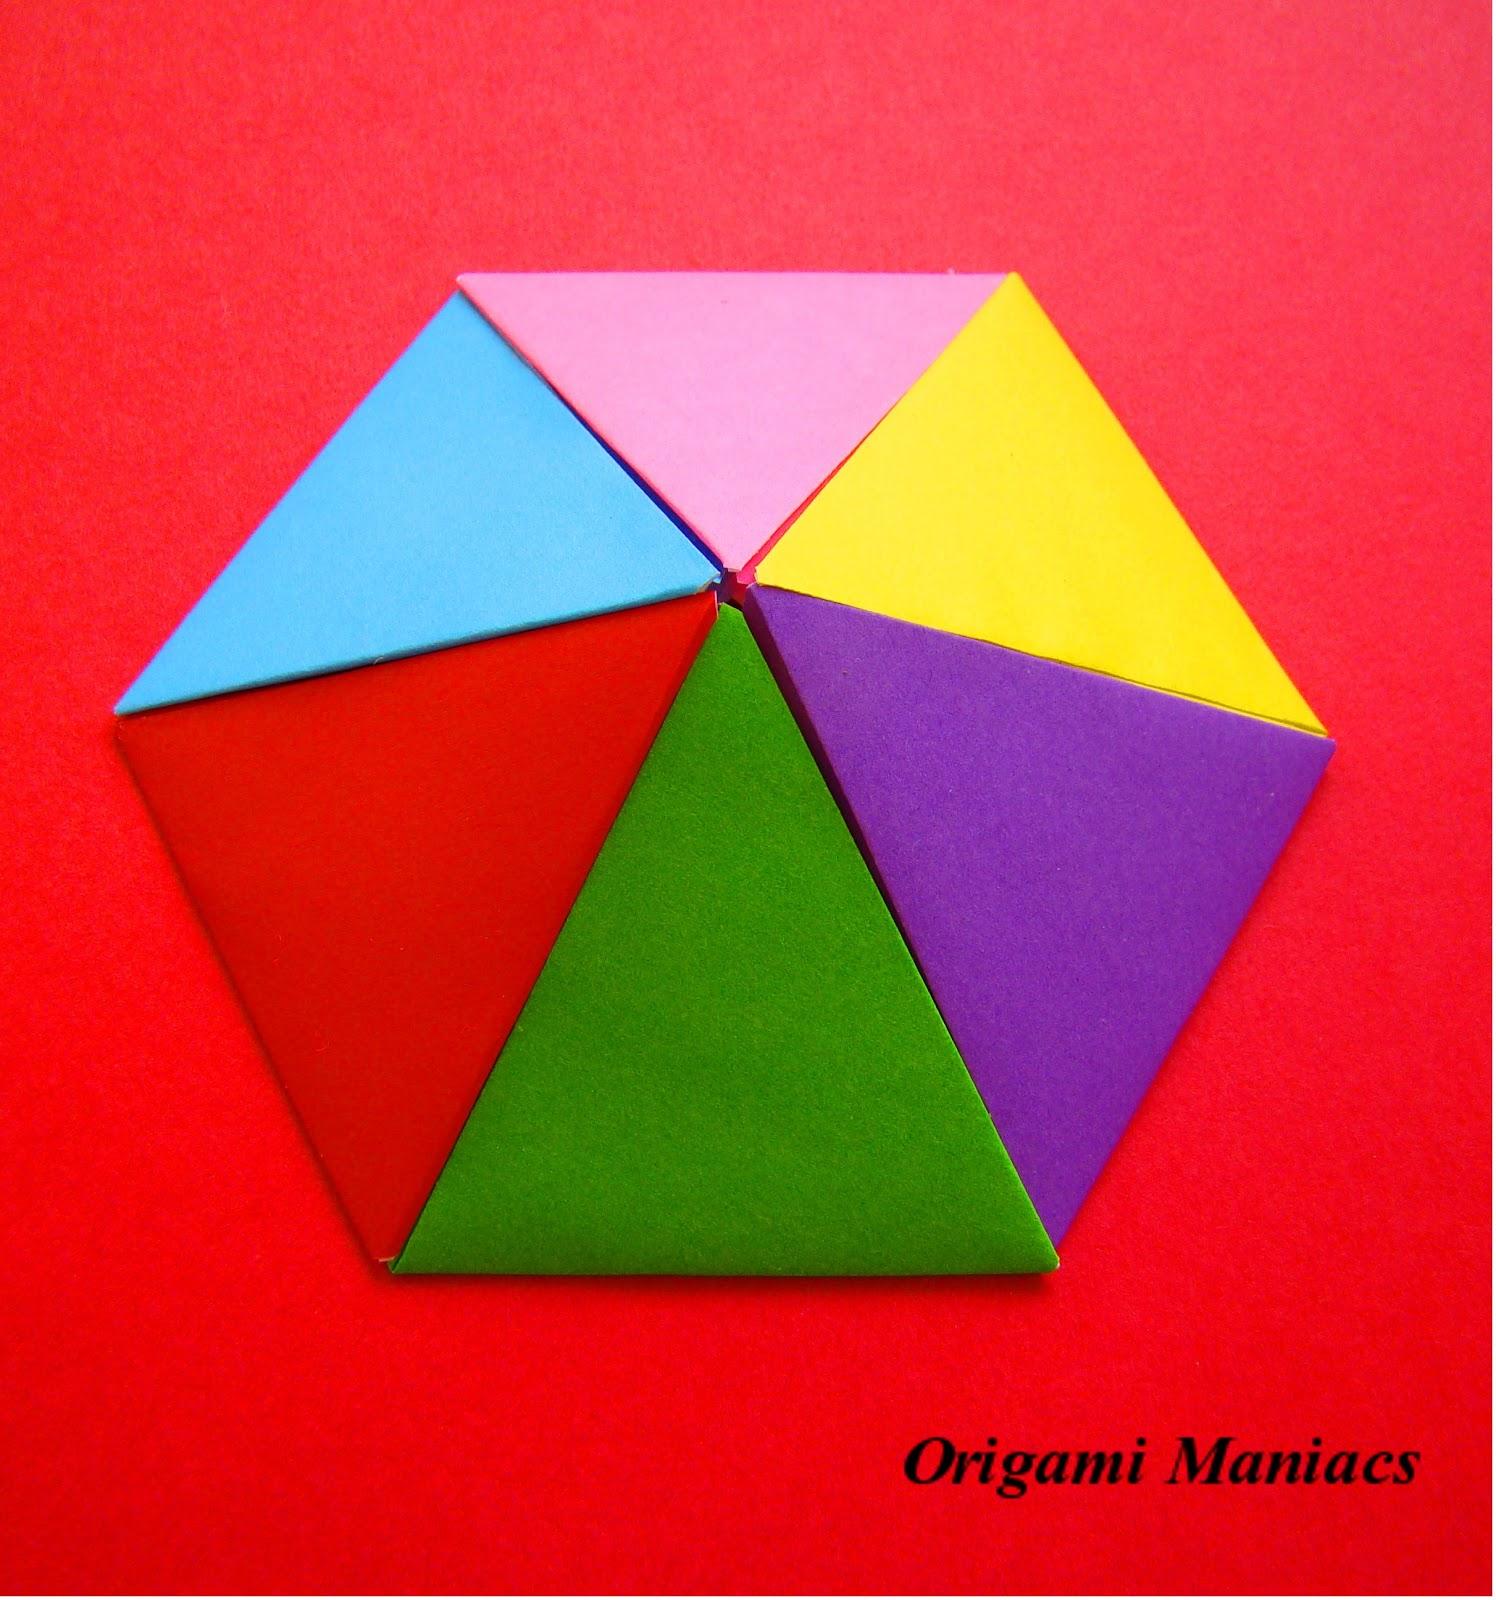 origami maniacs origami pyramids